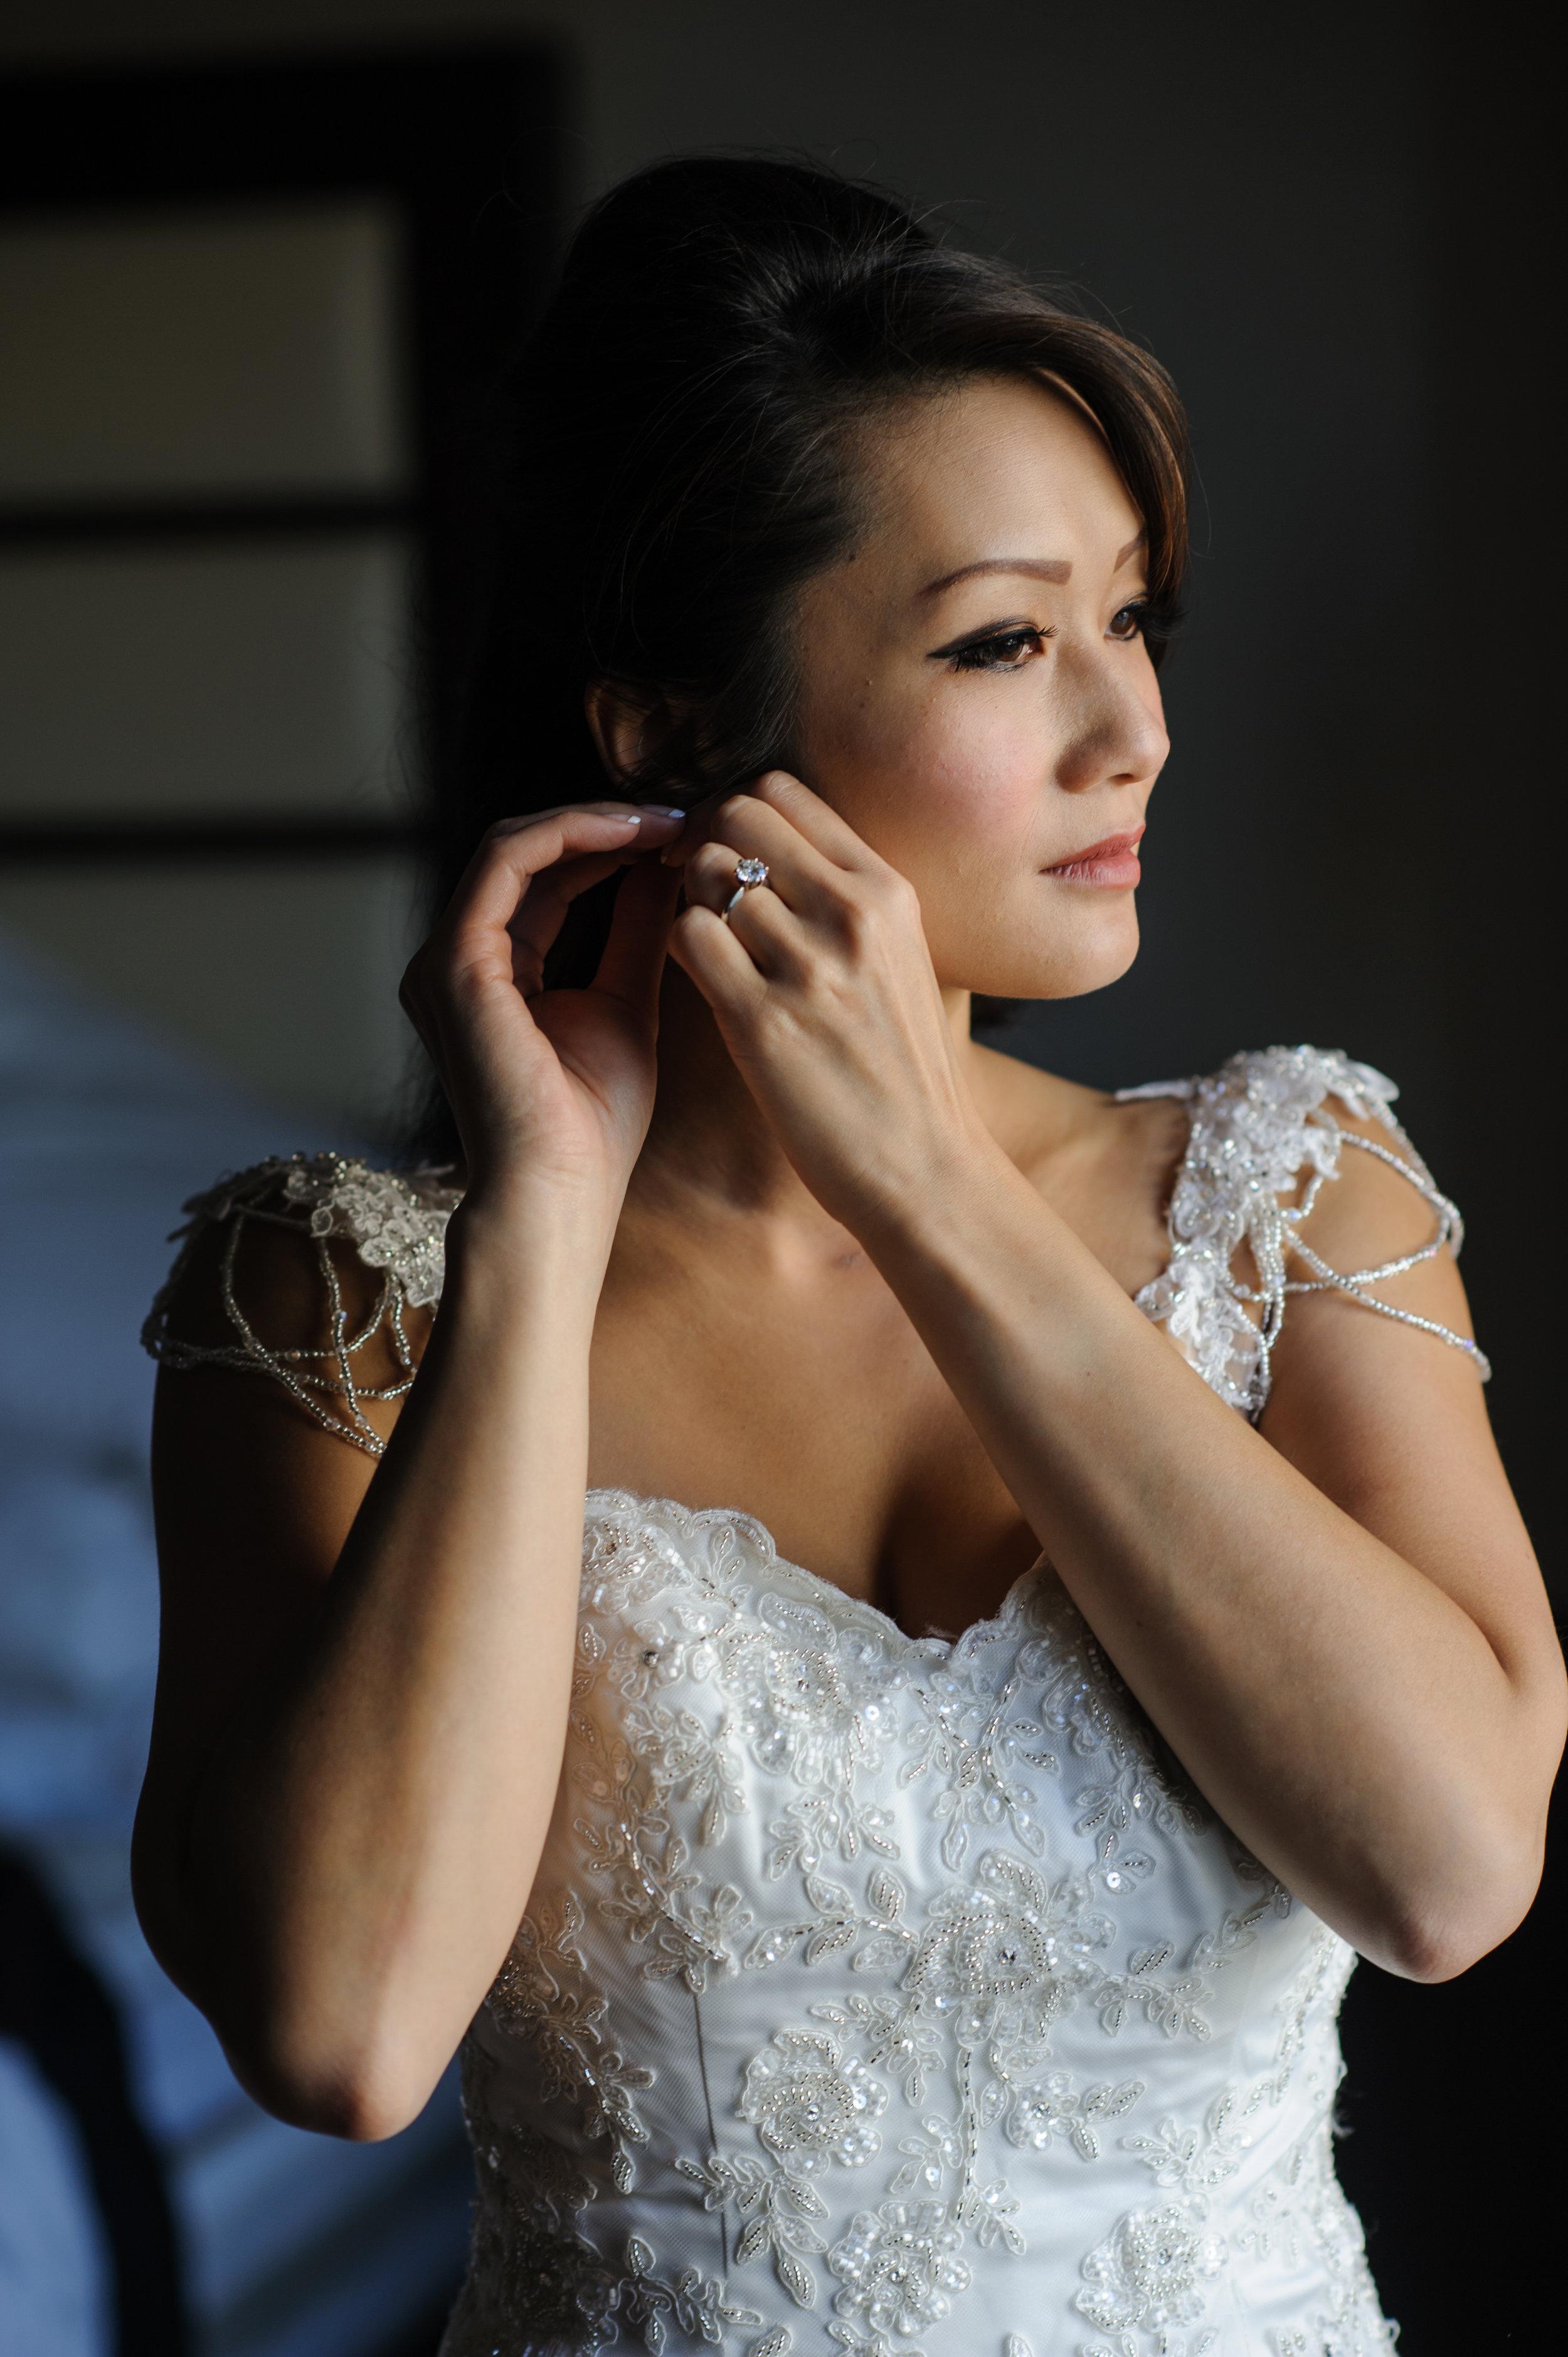 camilla-thuy-056-memorial-auditorium-sacramento-wedding-photographer-katherine-nicole-photography.JPG